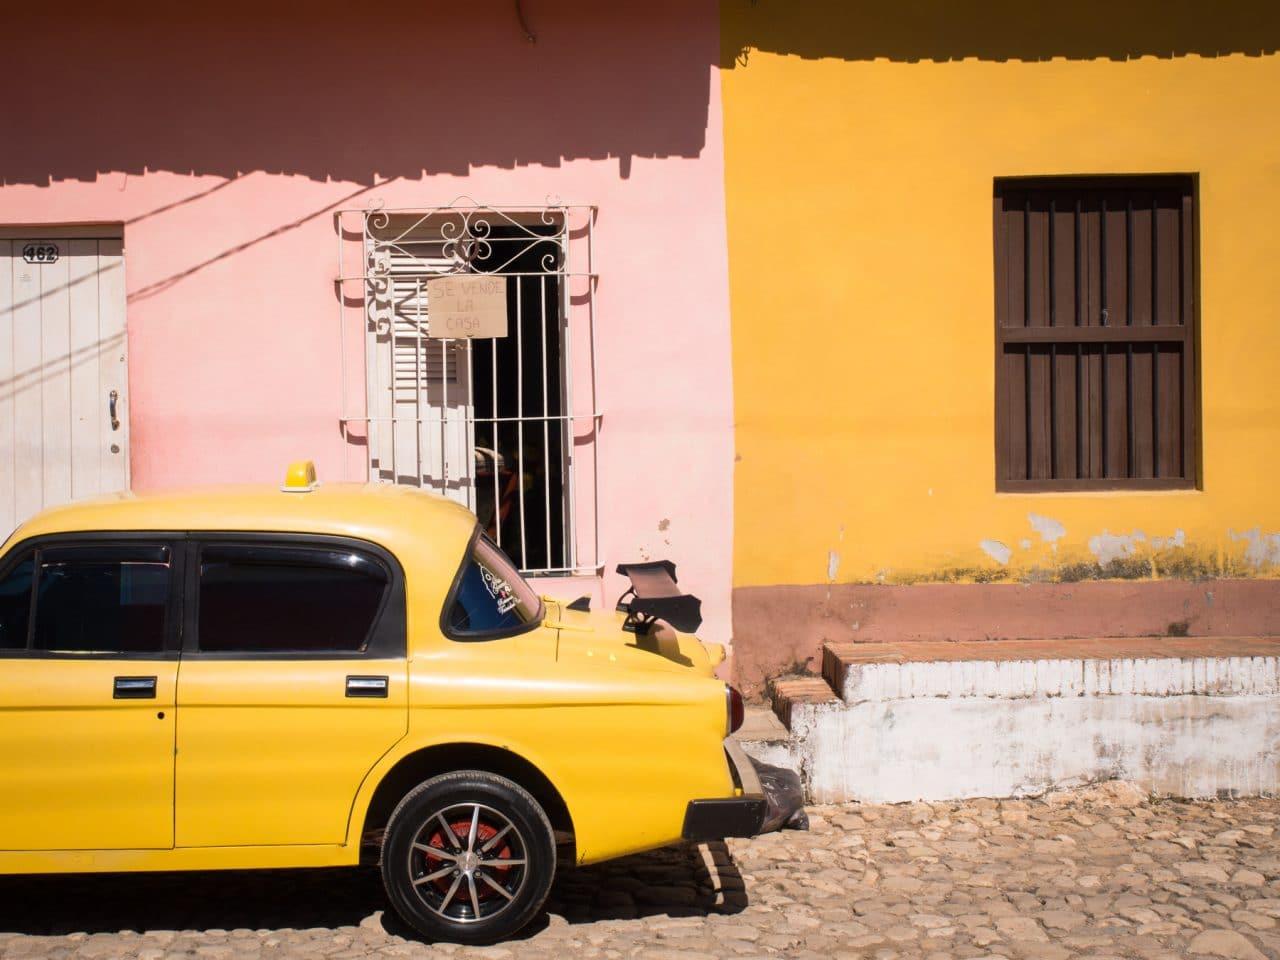 cuba voitures anciennes-tourisme trinidad cuba-photo trinidad